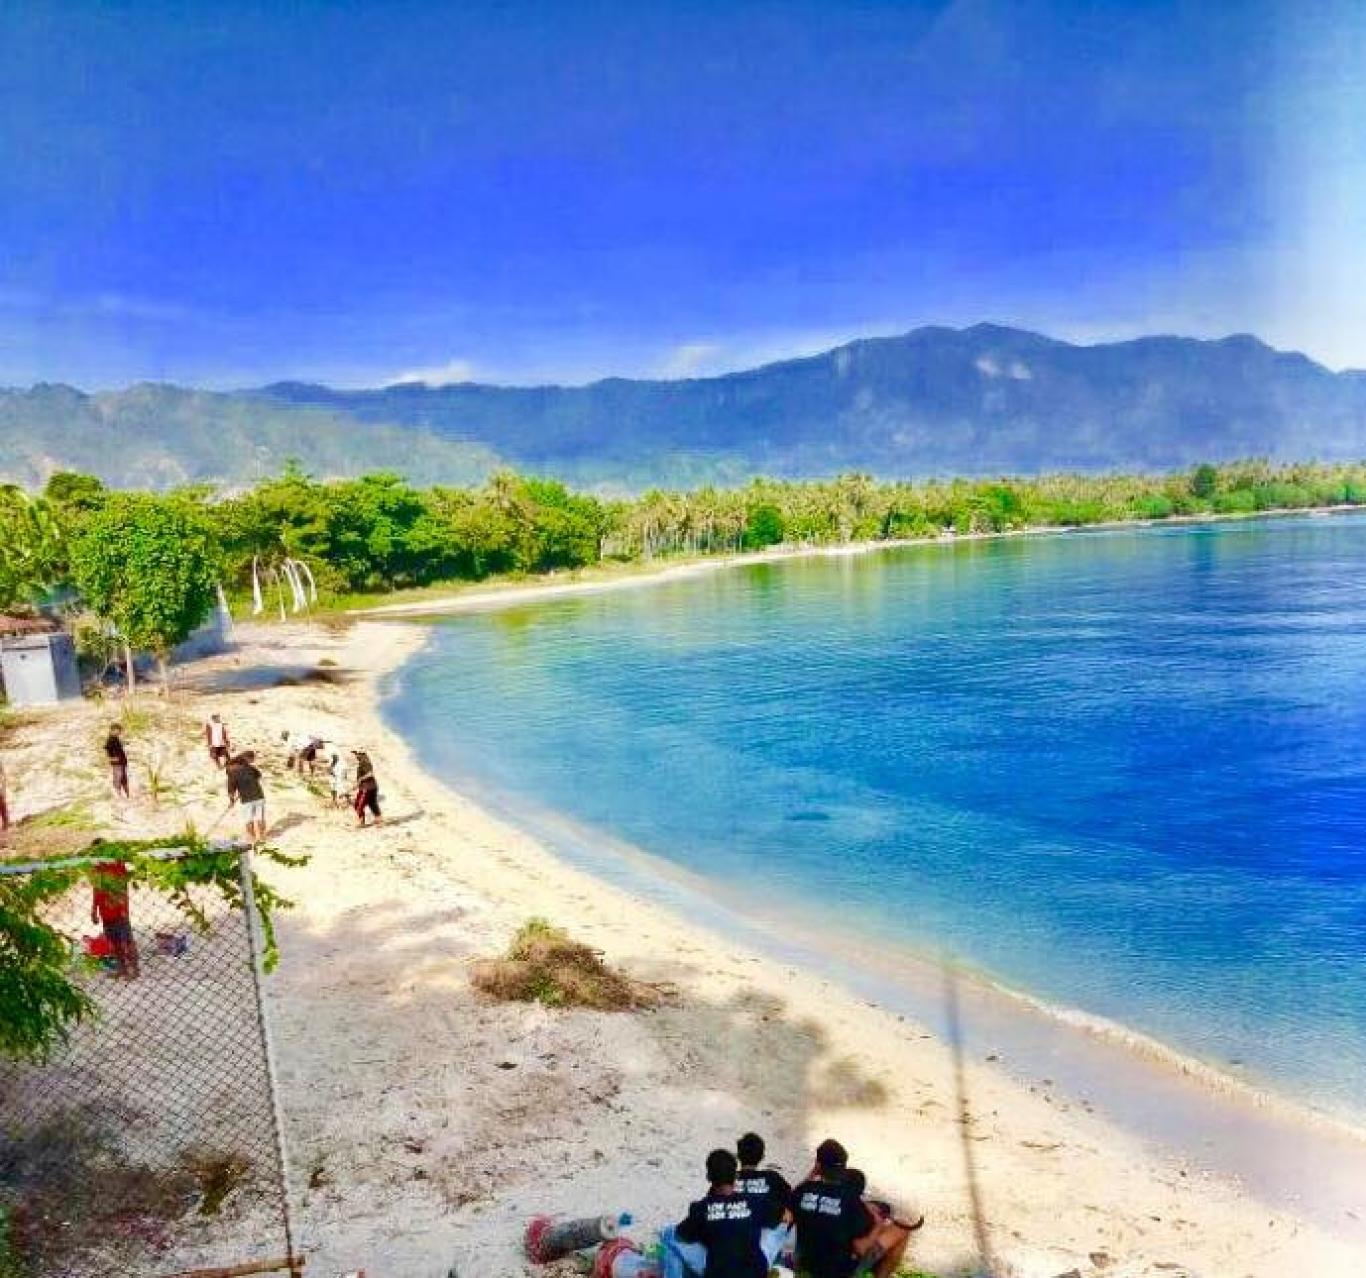 Objek Wisata Pantai Karang Rata Desa Pengulon Website Desa